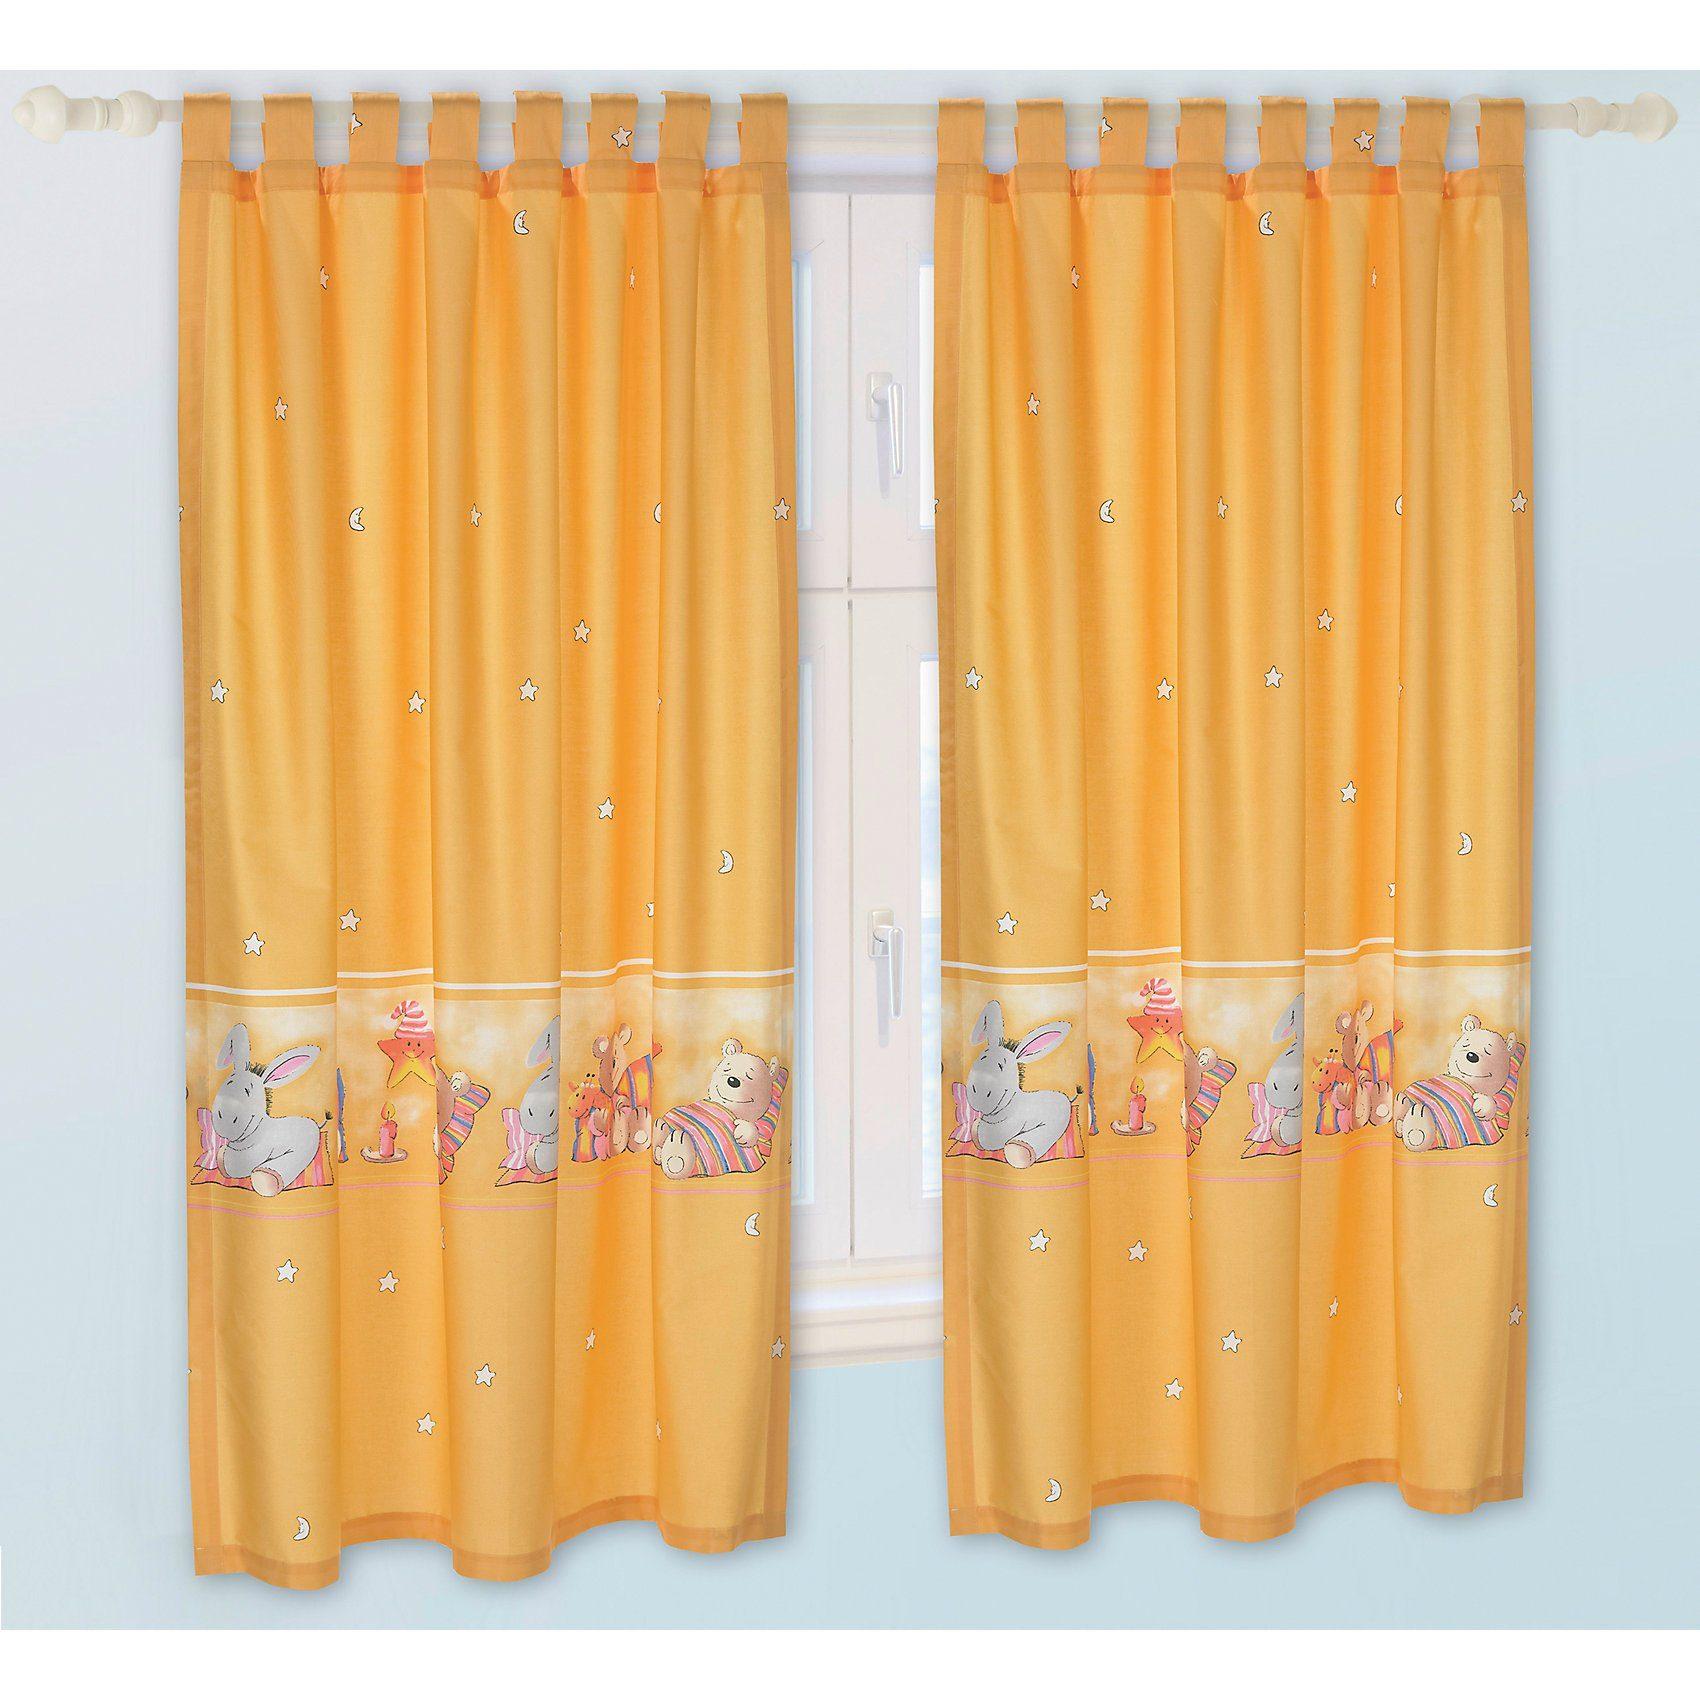 Vorhang Set Donkey, gelb, je 130 x 150 cm (2 Schals)